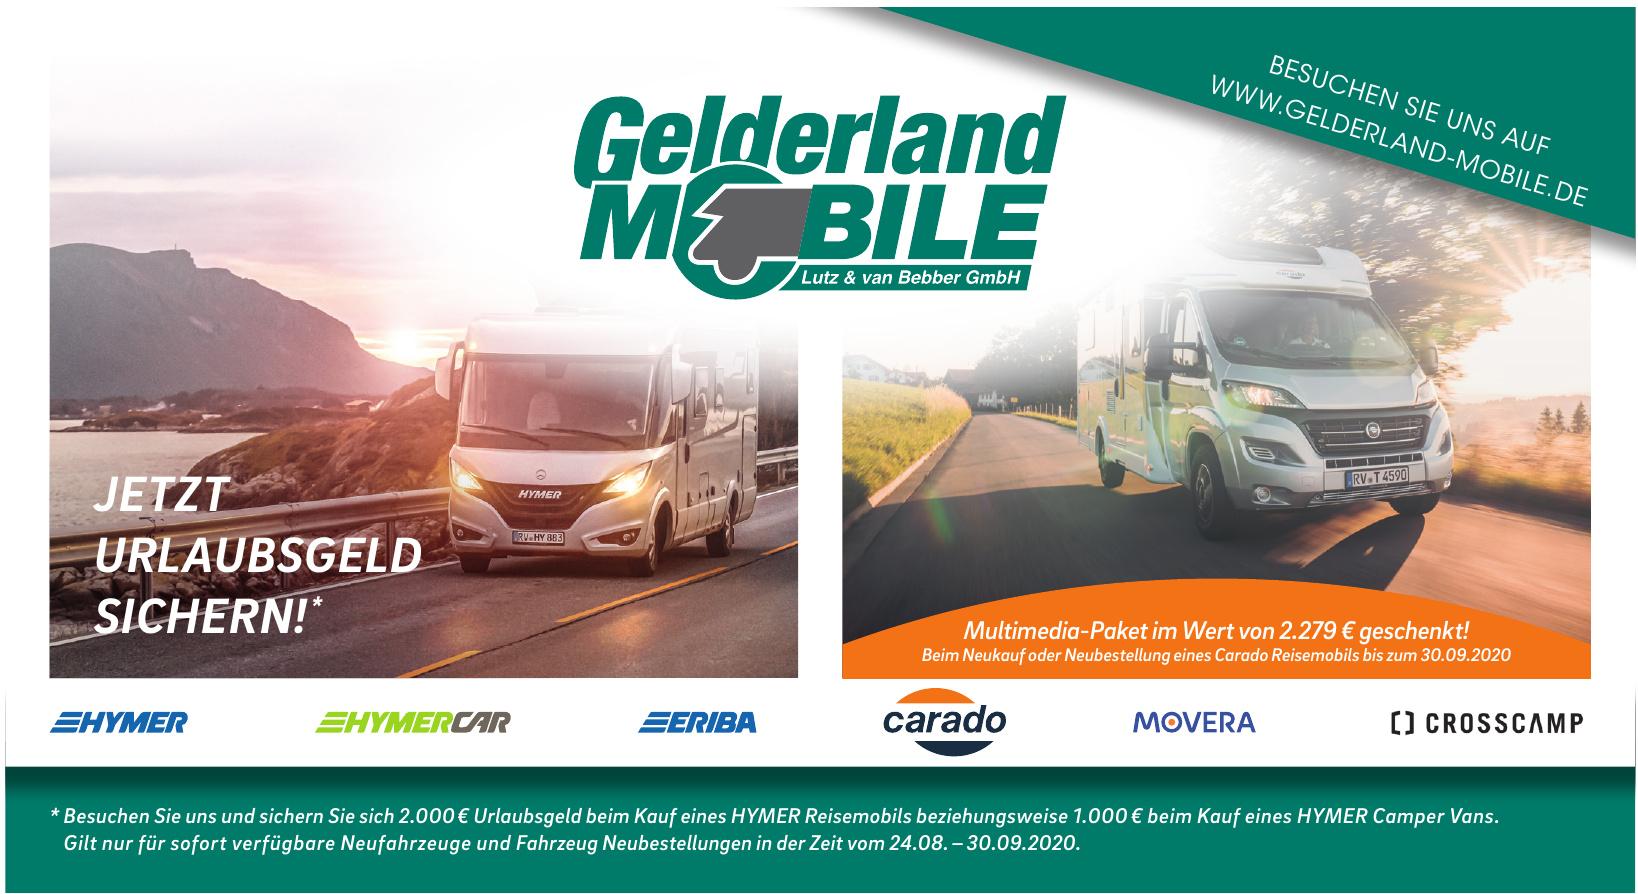 Gelderland Mobile